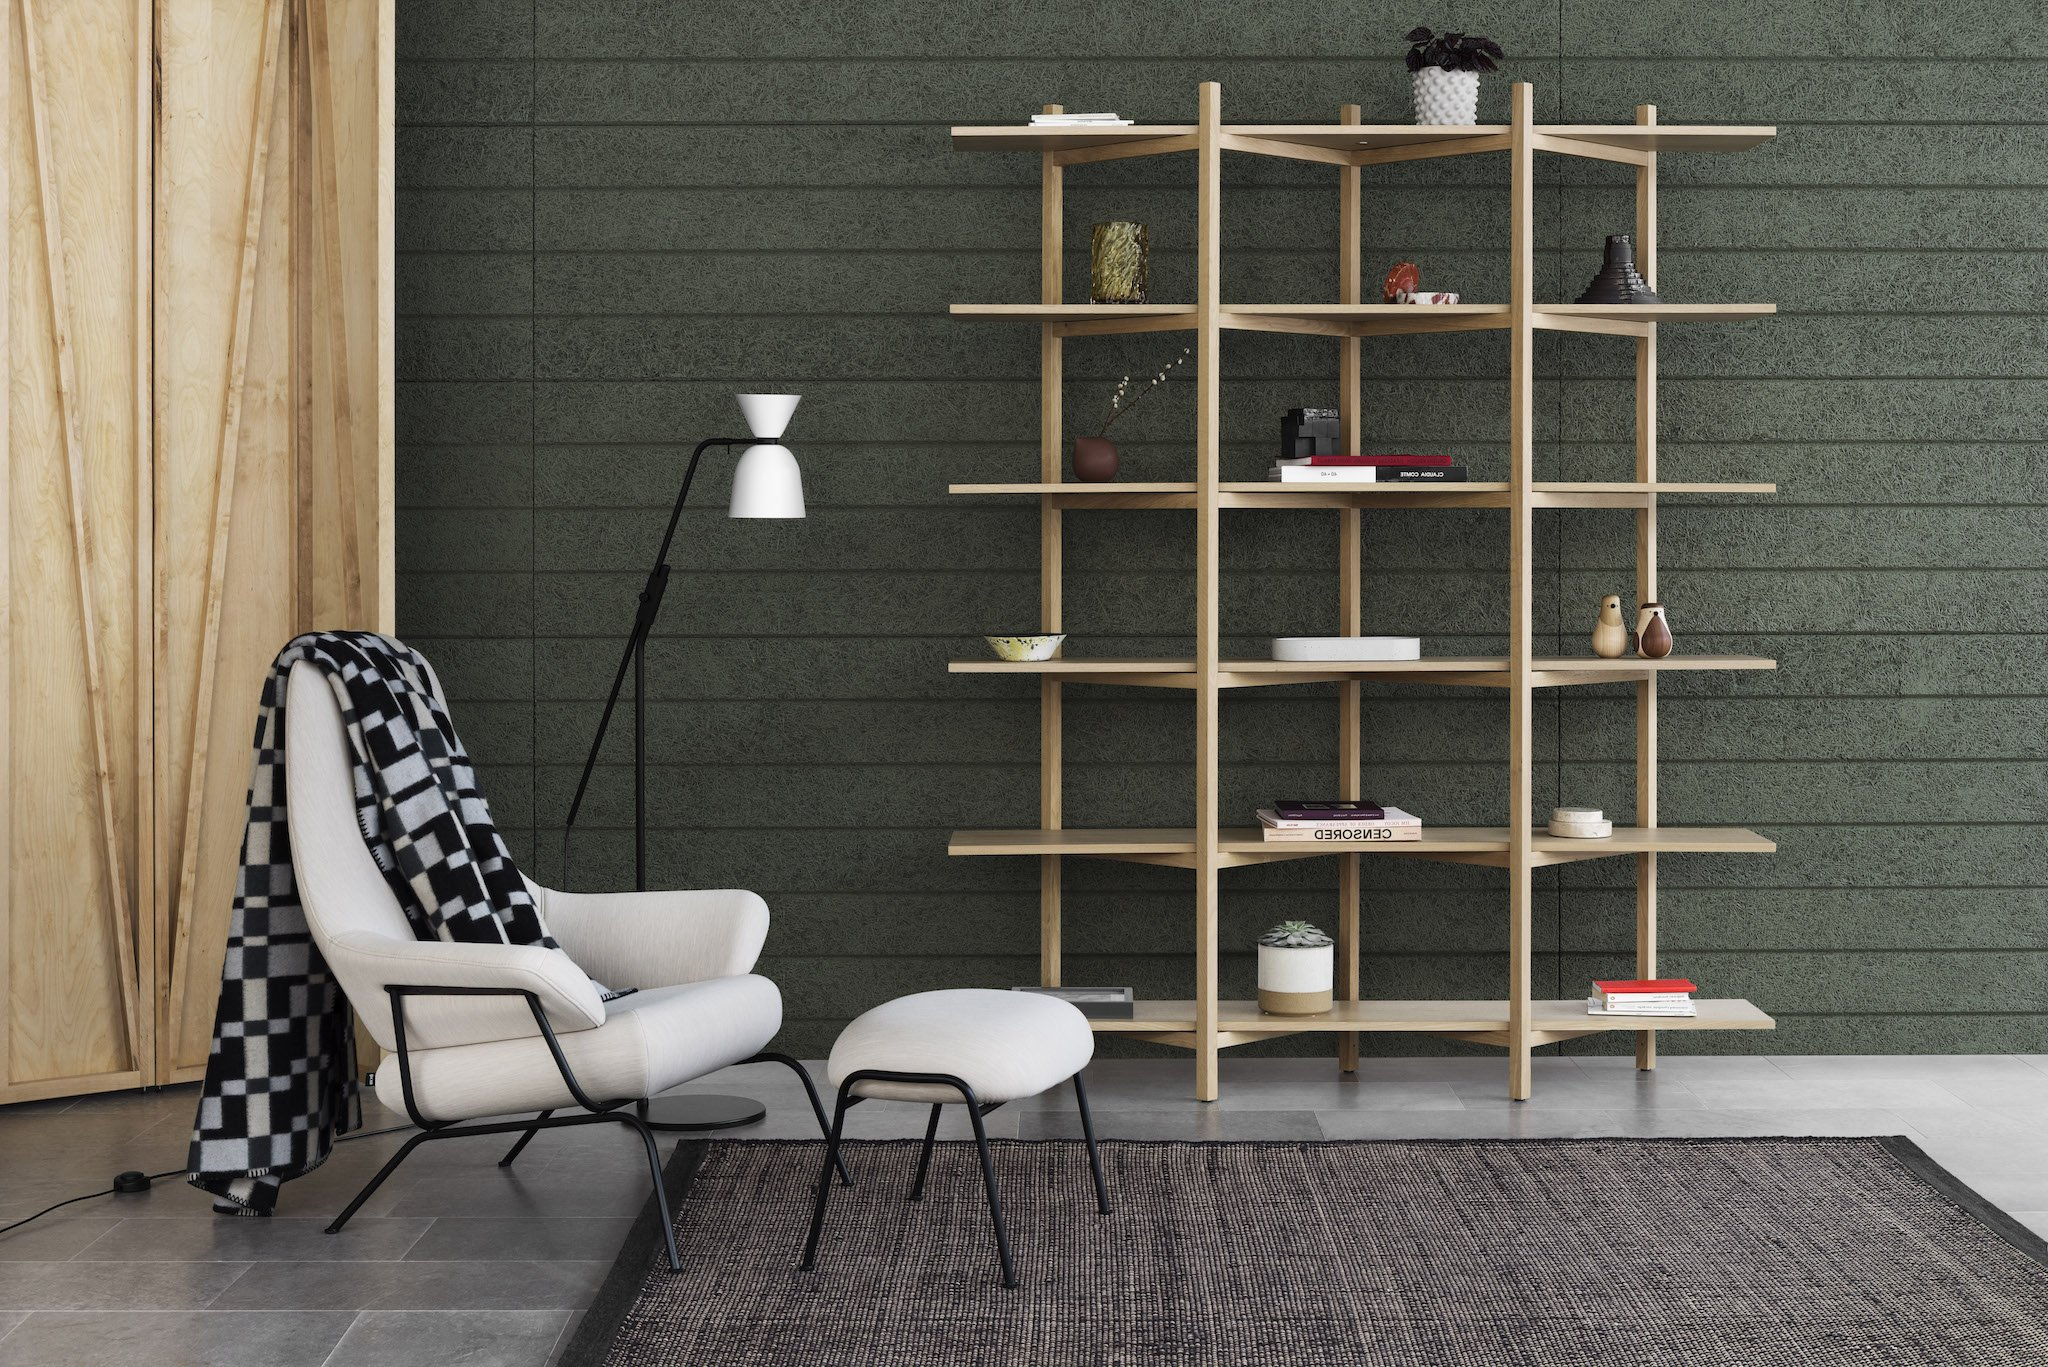 Best Showrooms to Admire at Stockholm Design Week Hem - Hai Chair Hem Furniture Best Showrooms to Admire at Stockholm Design Week 2019: Hem Furniture Best Showrooms to Admire at Stockholm Design Week Hem Hai Chair